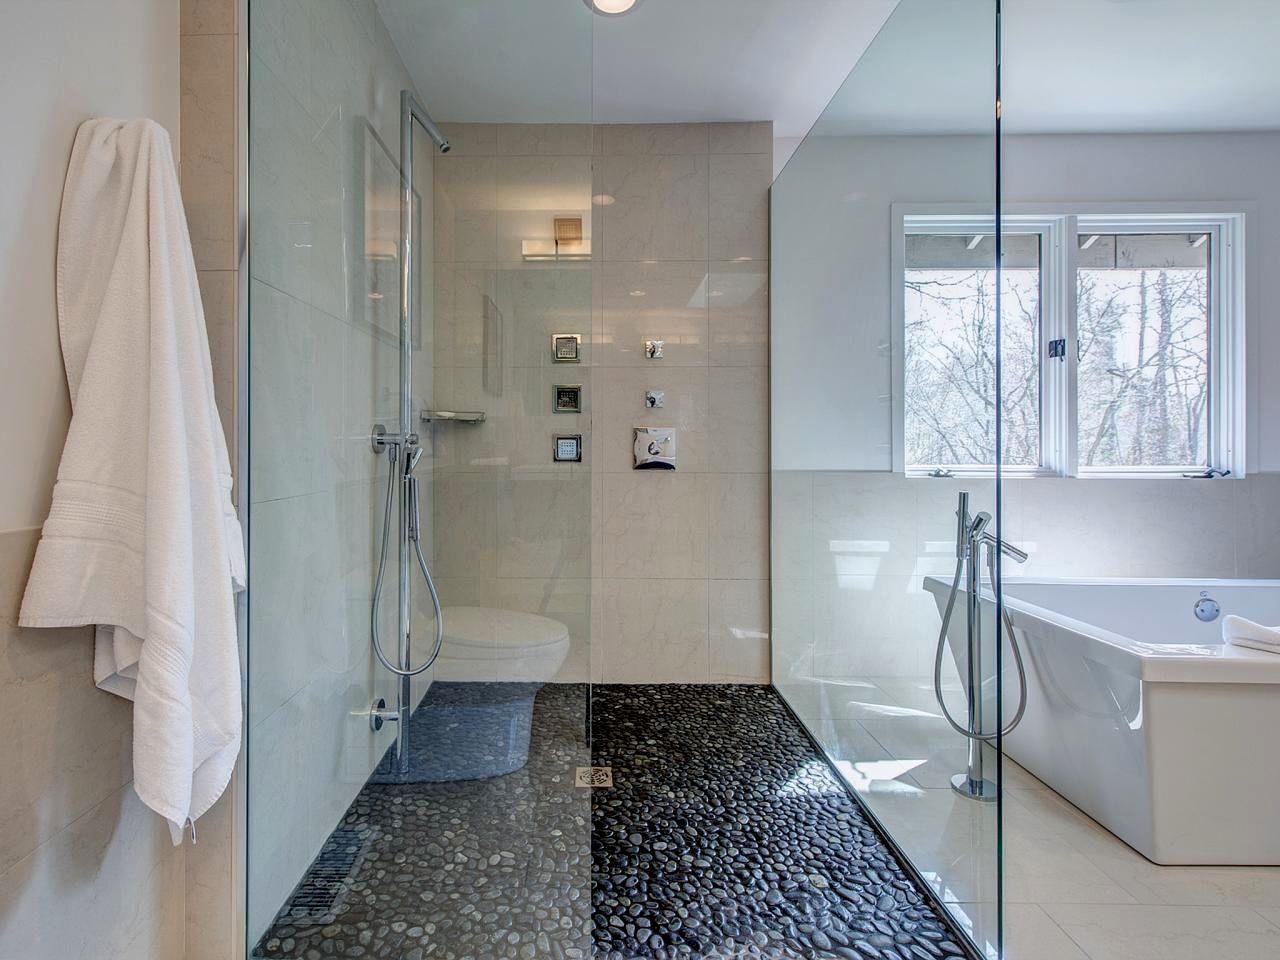 cool tile bathroom ideas online-Amazing Tile Bathroom Ideas Photograph